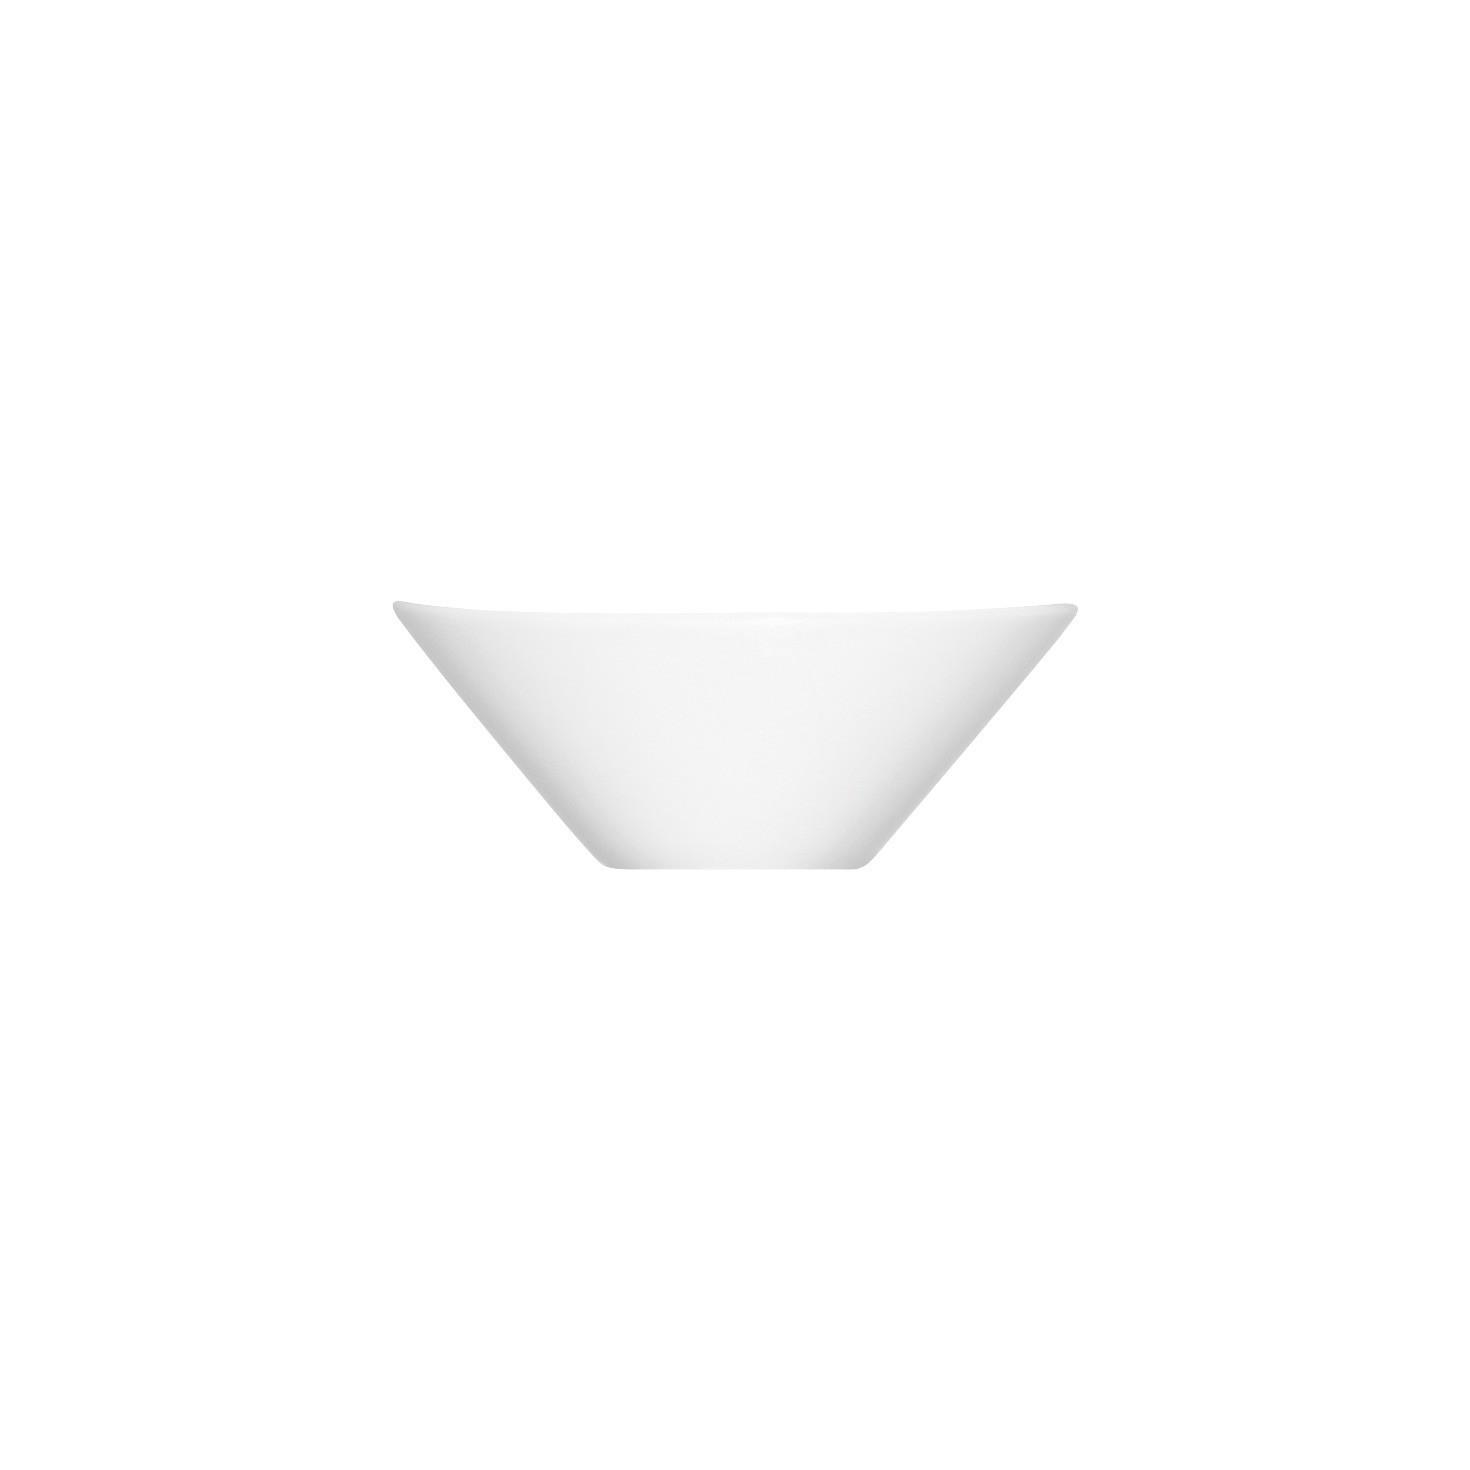 Options, Schale oval 108 x 61 mm / 0,08 l